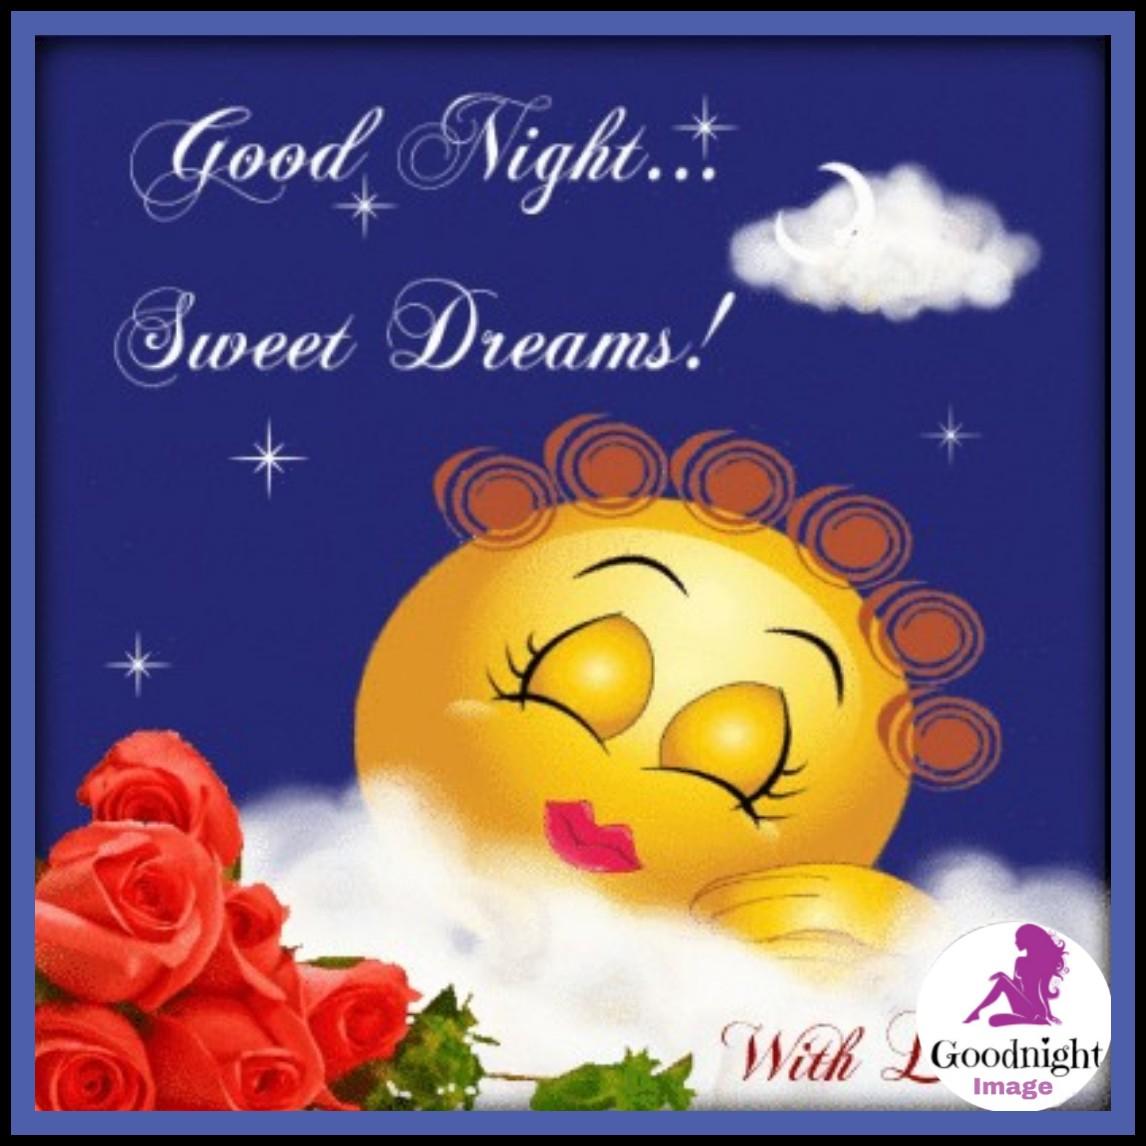 Good Night%2BImage 24